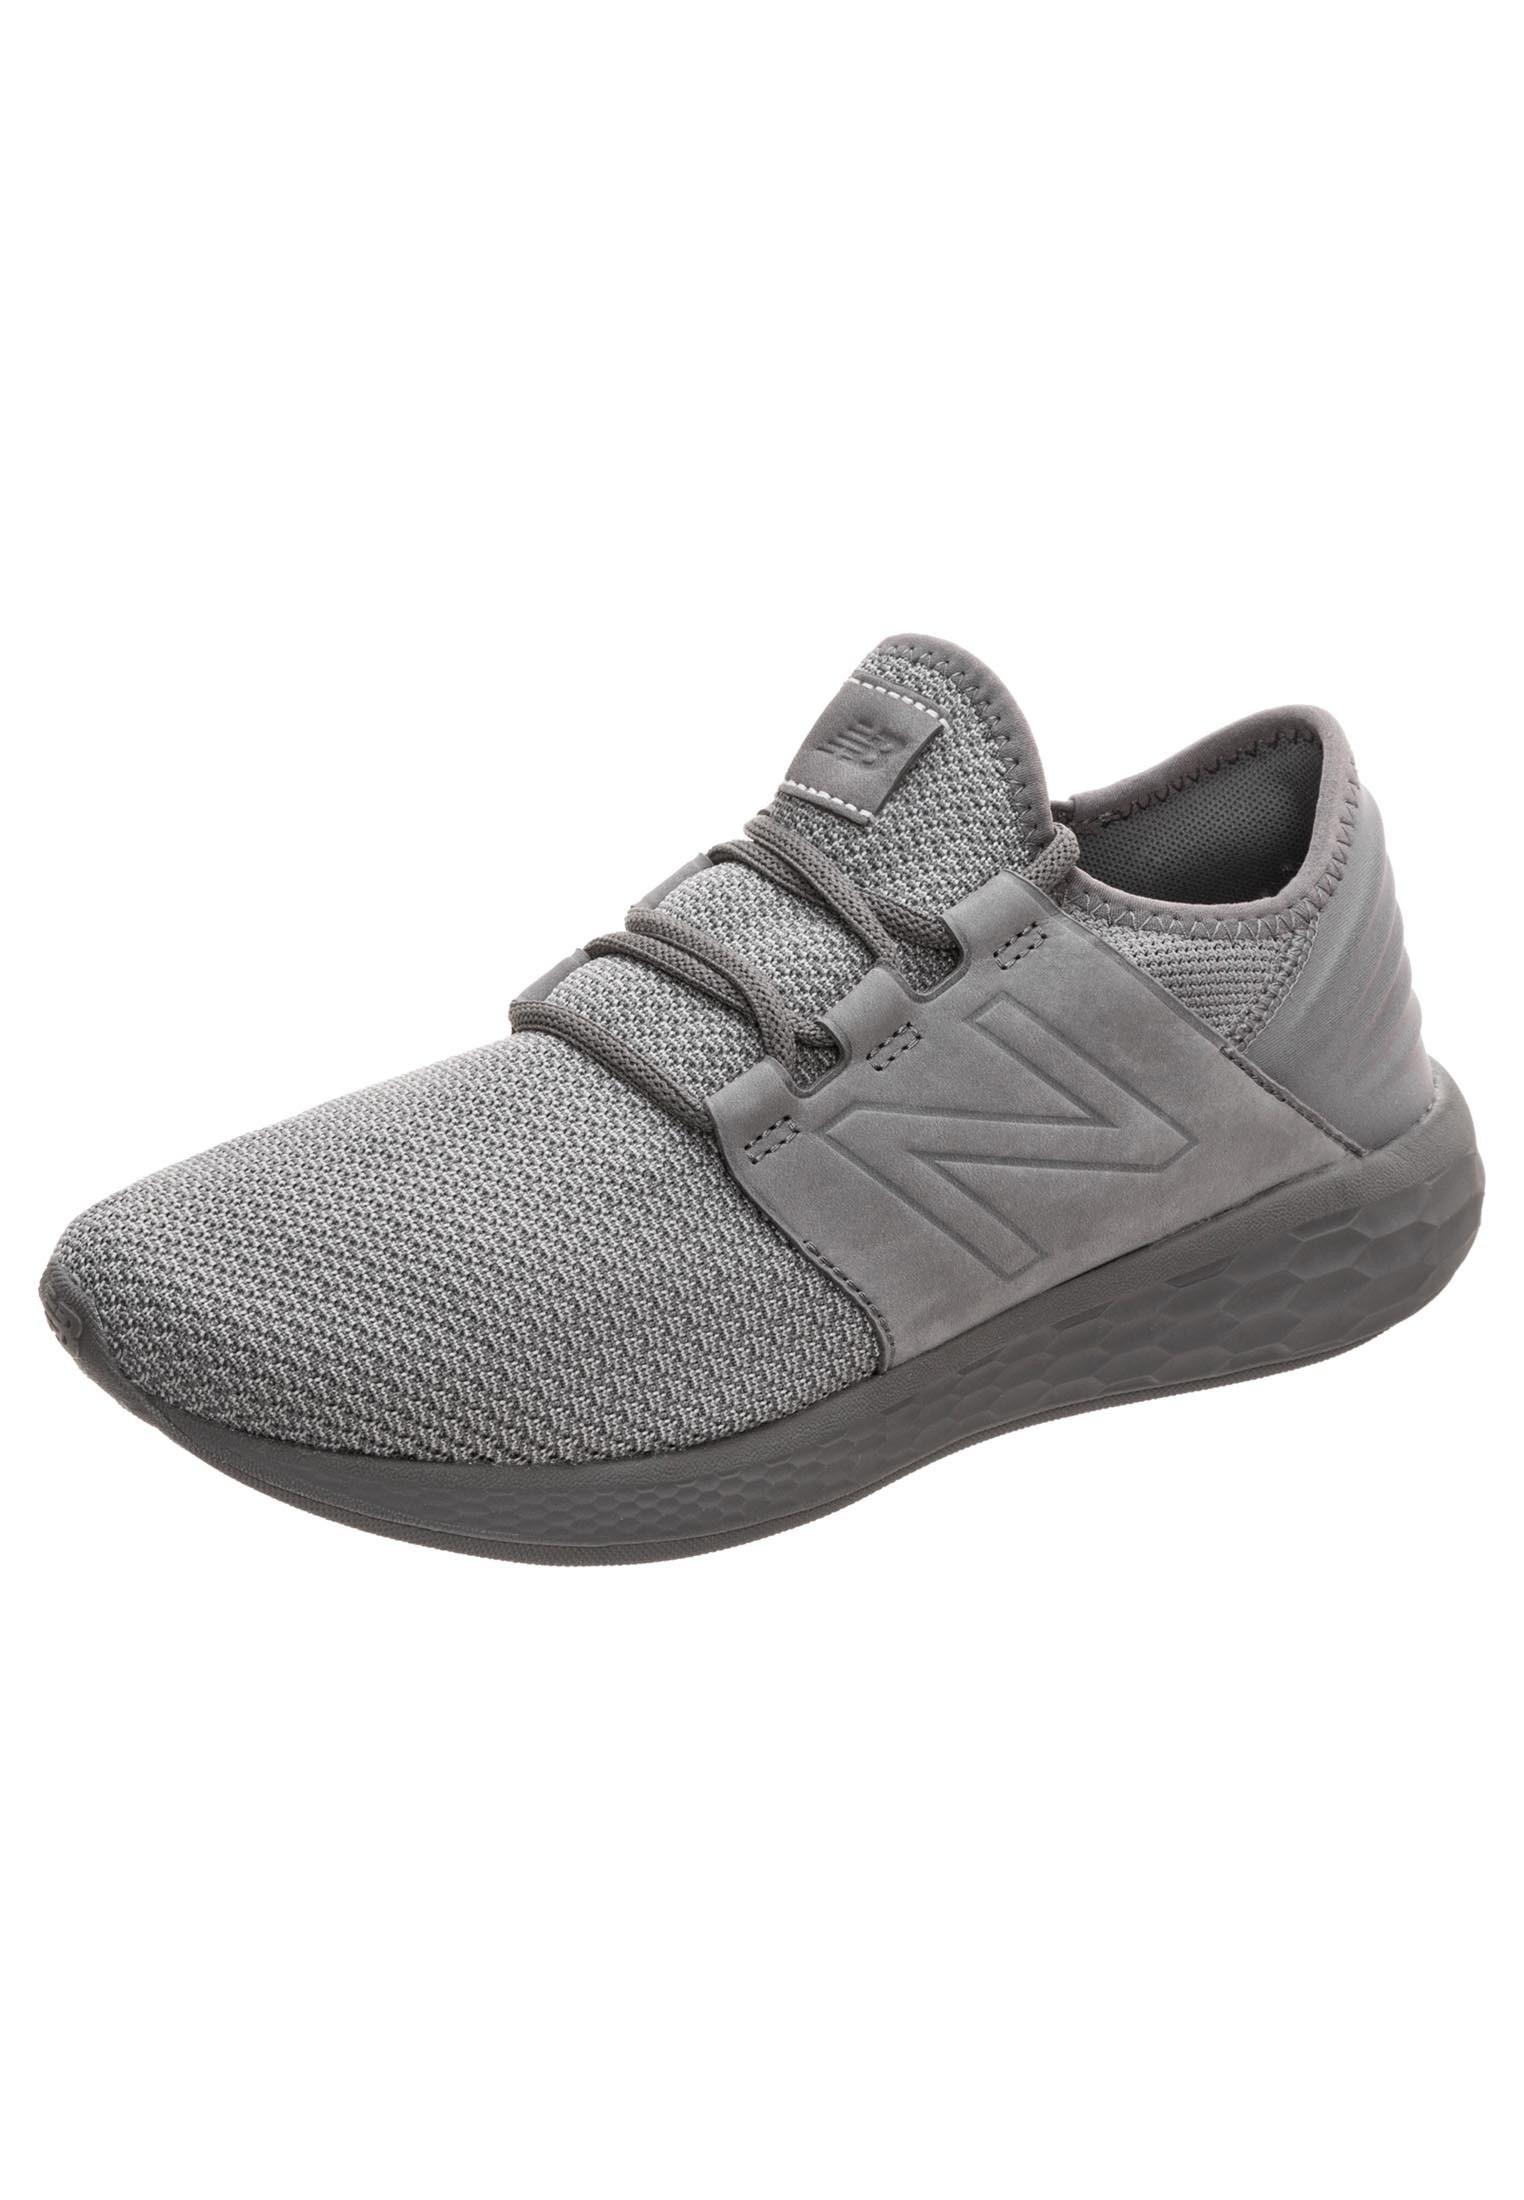 New Balance Běžecká obuv  Fresh Foam Cruz v2 Knit  šedá - Glami.cz 45a2f86445f78